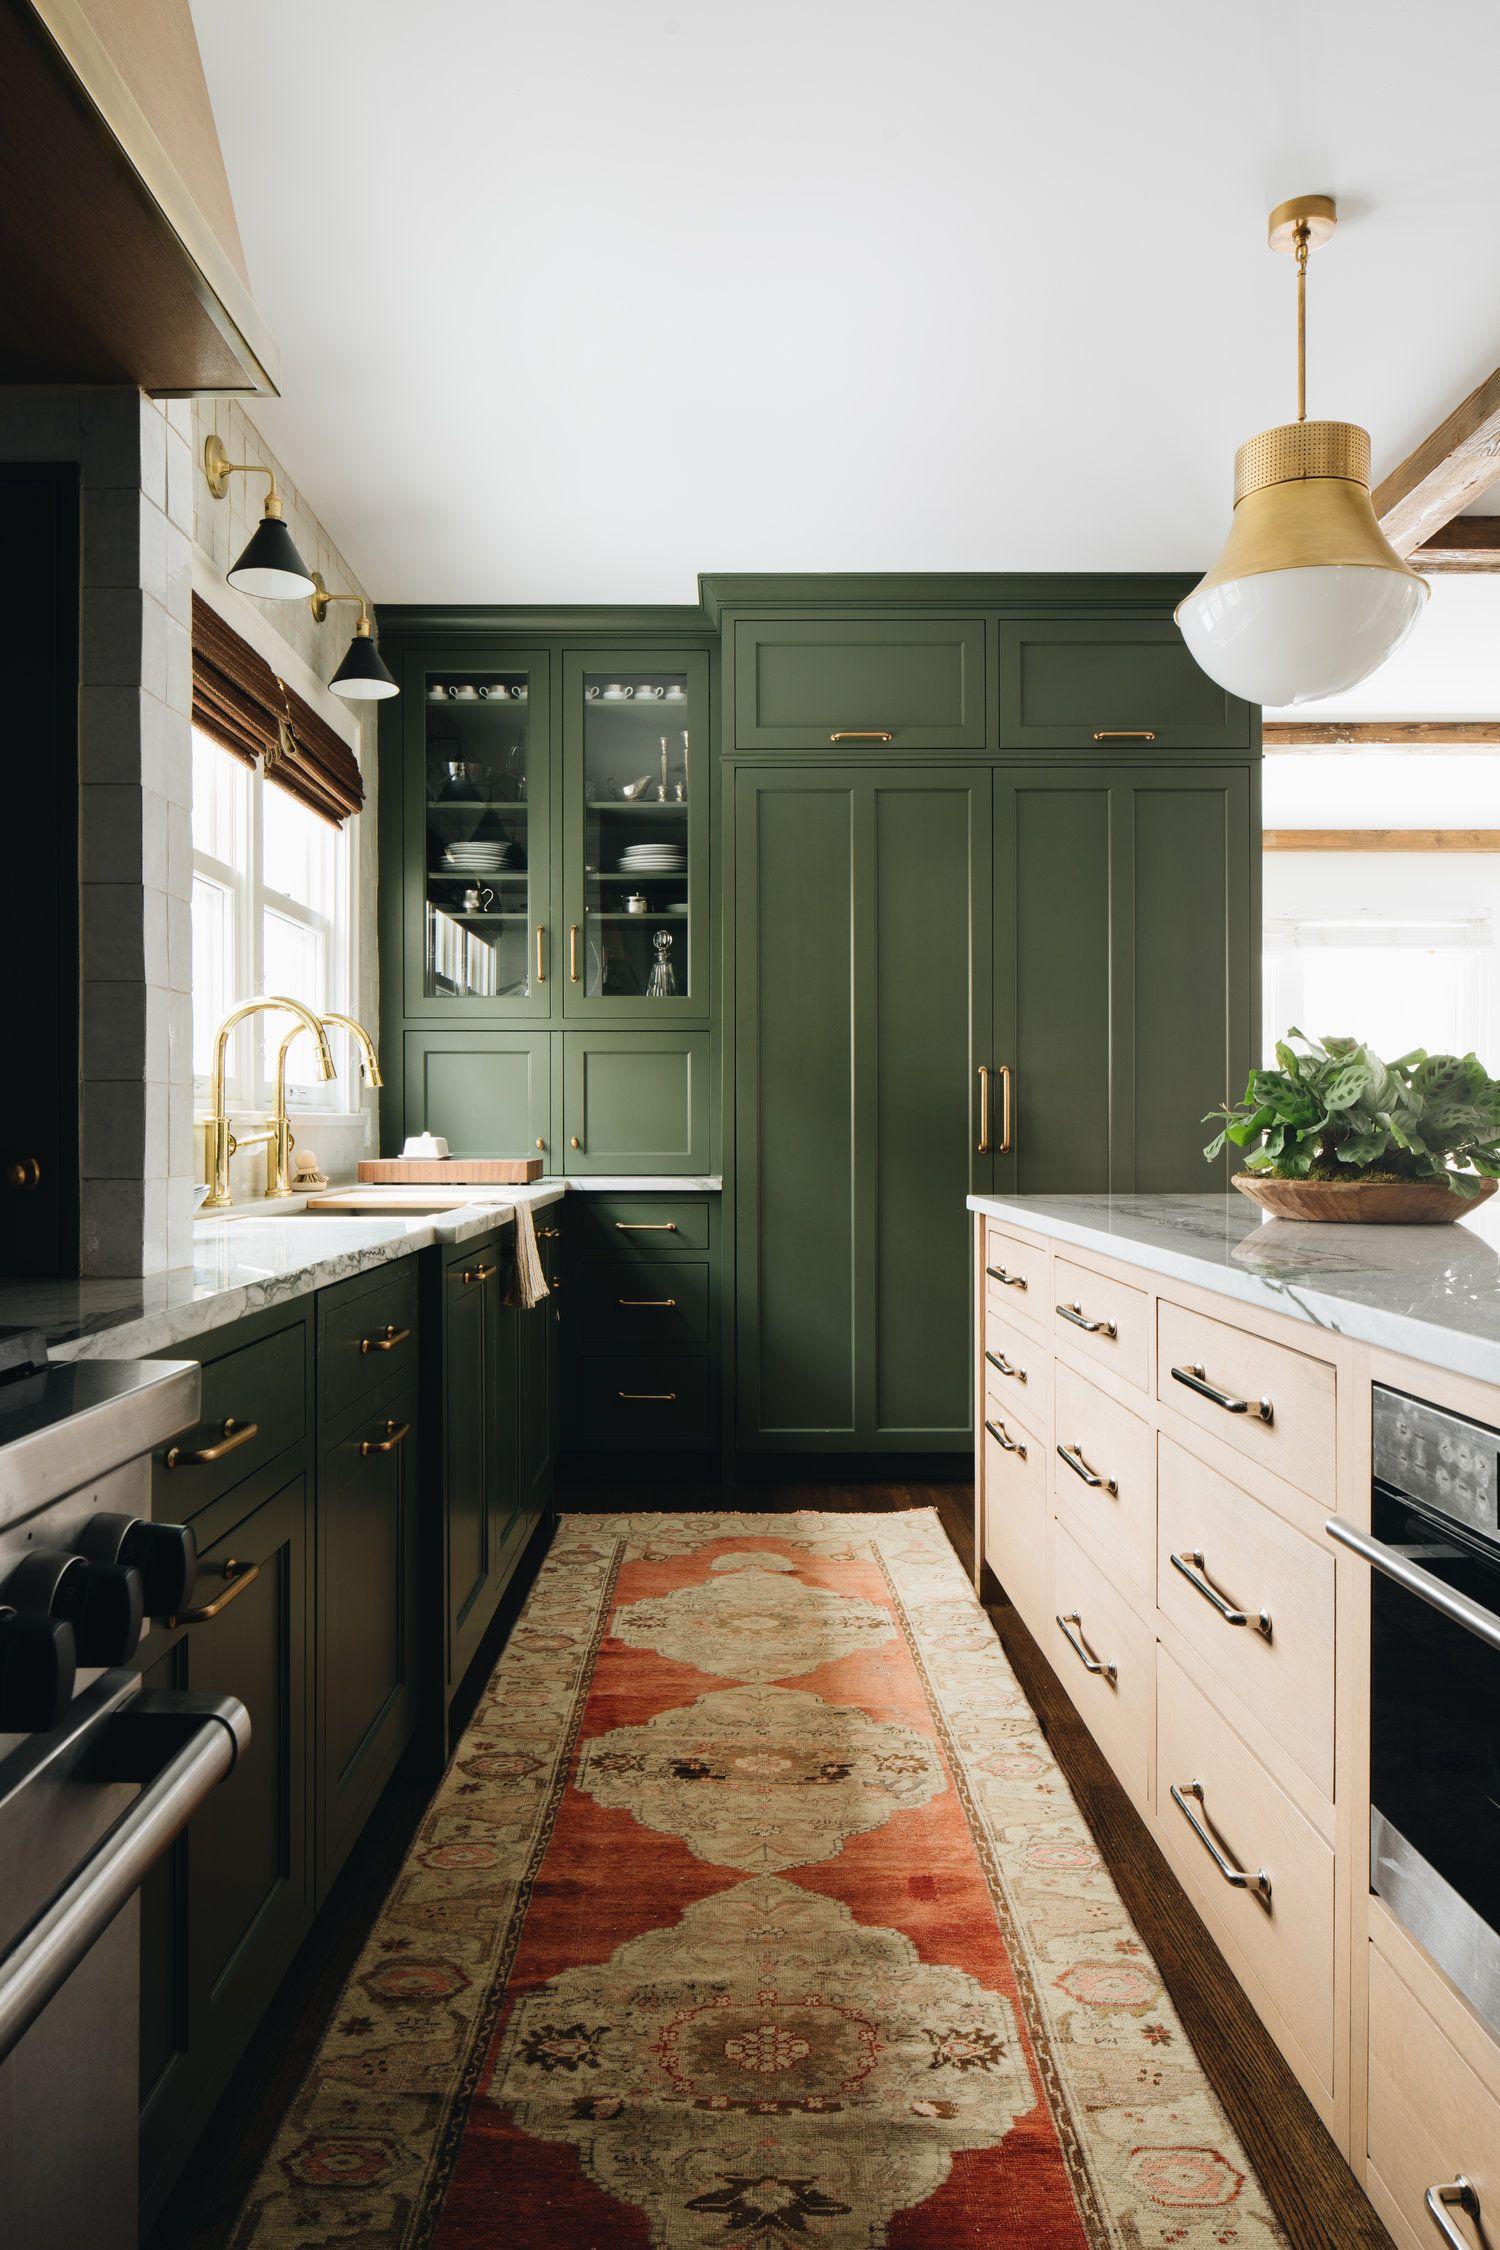 Fair Oaks Jean Stoffer Design Green Kitchen Cabinets Kitchen Design Green Cabinets